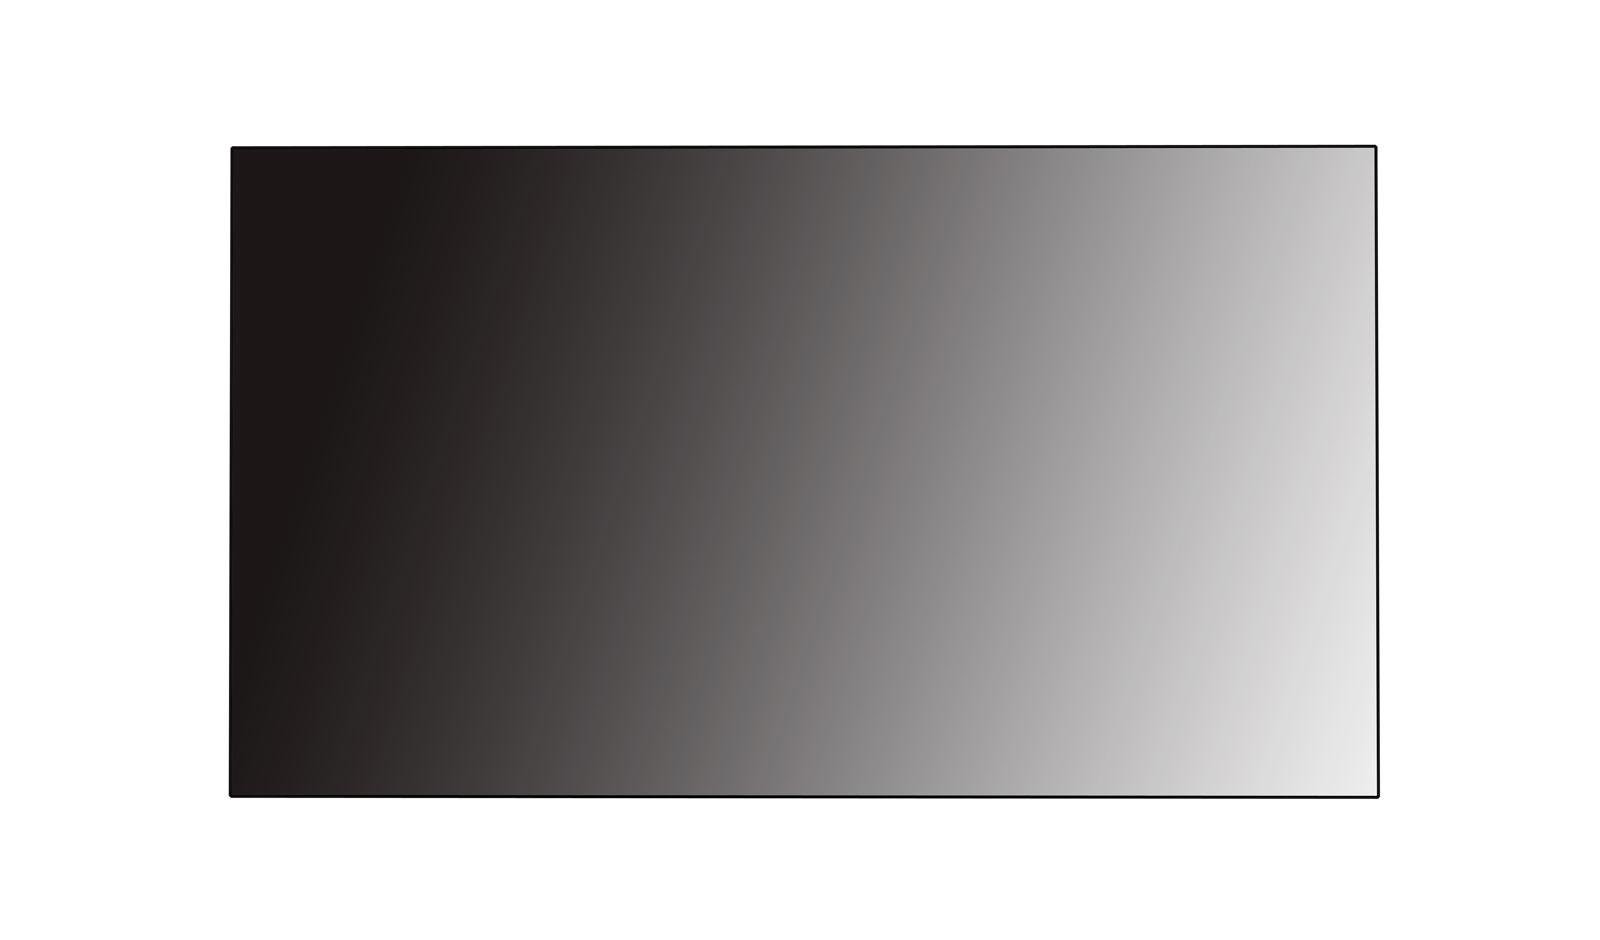 LG - Profissional 55P Full HD 500CD 24/7 VIDEOWALL 0.9MM 55VM5E